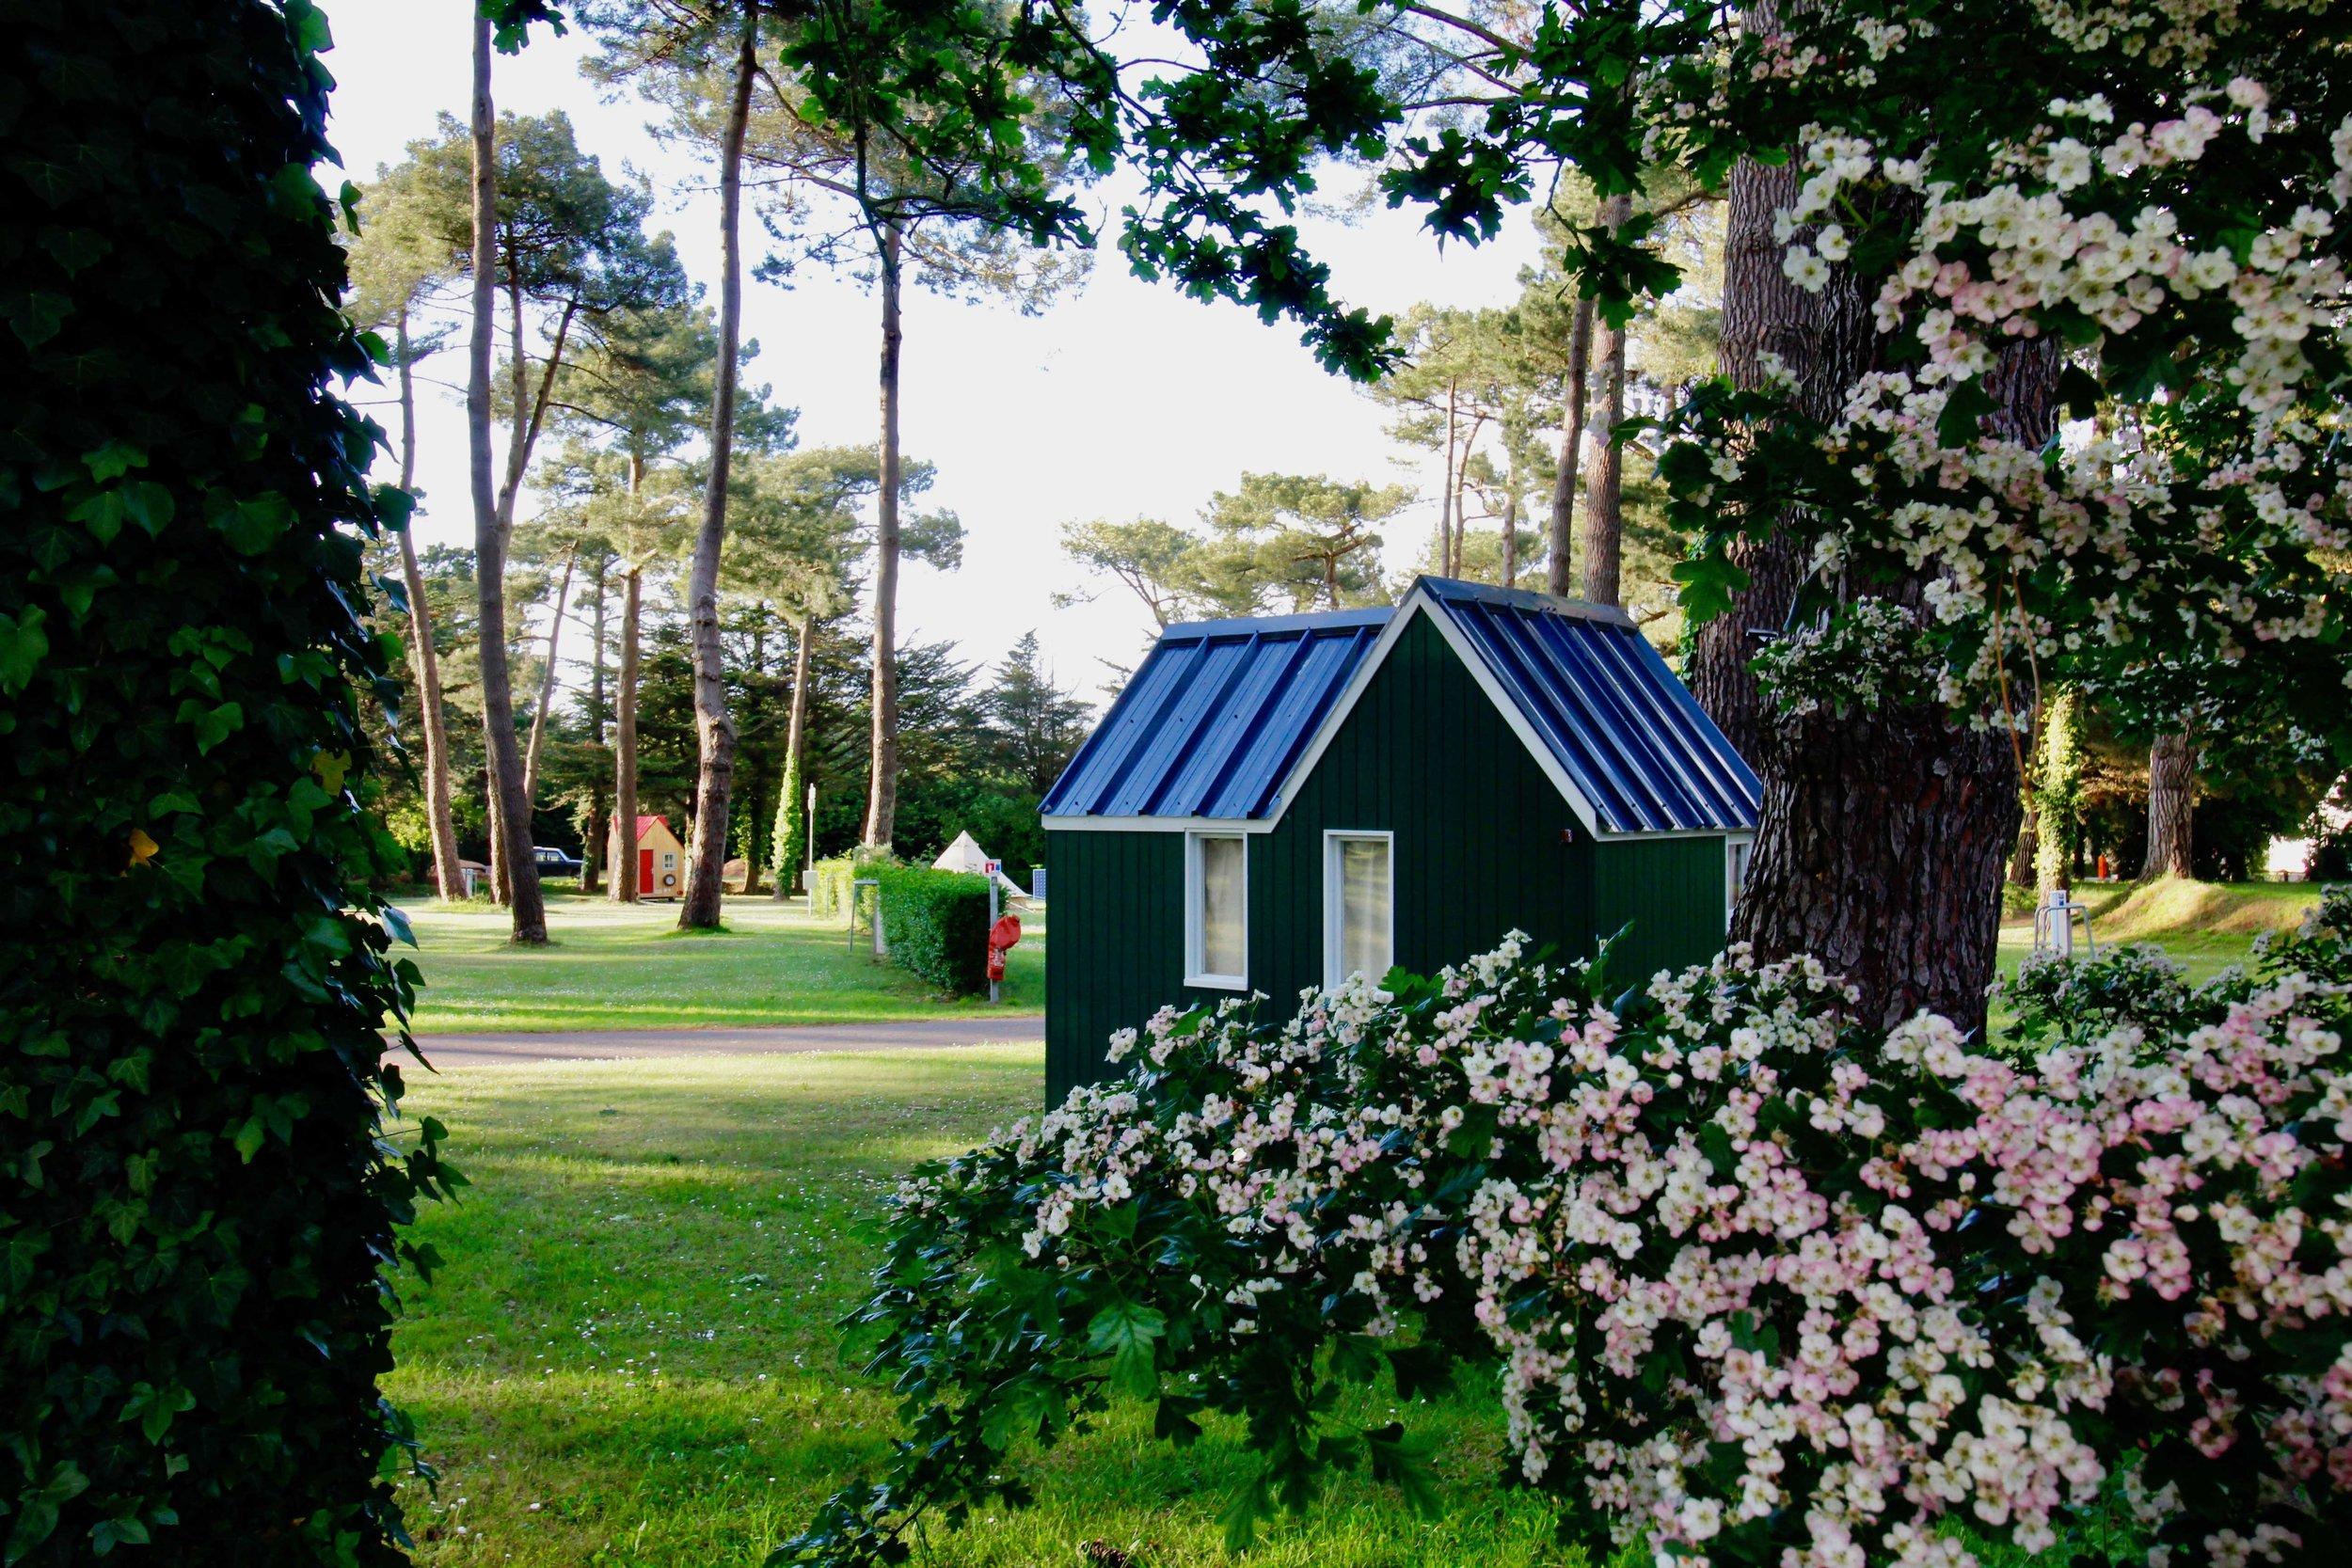 The campsite -